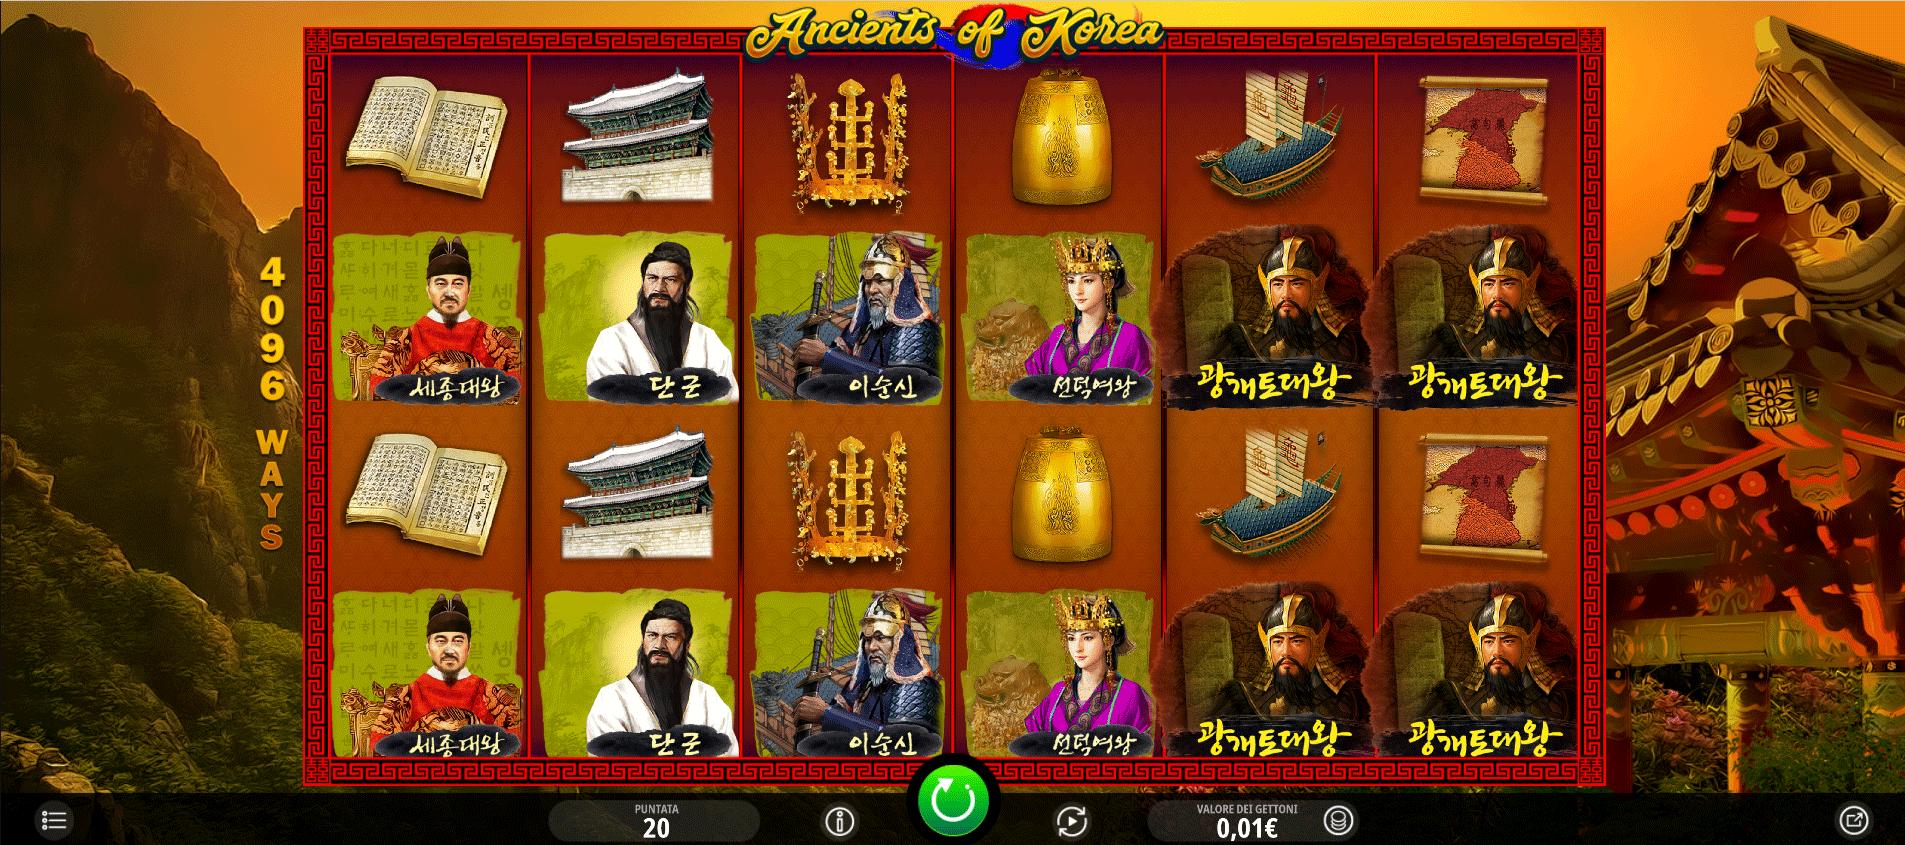 Slot Ancients of Korea